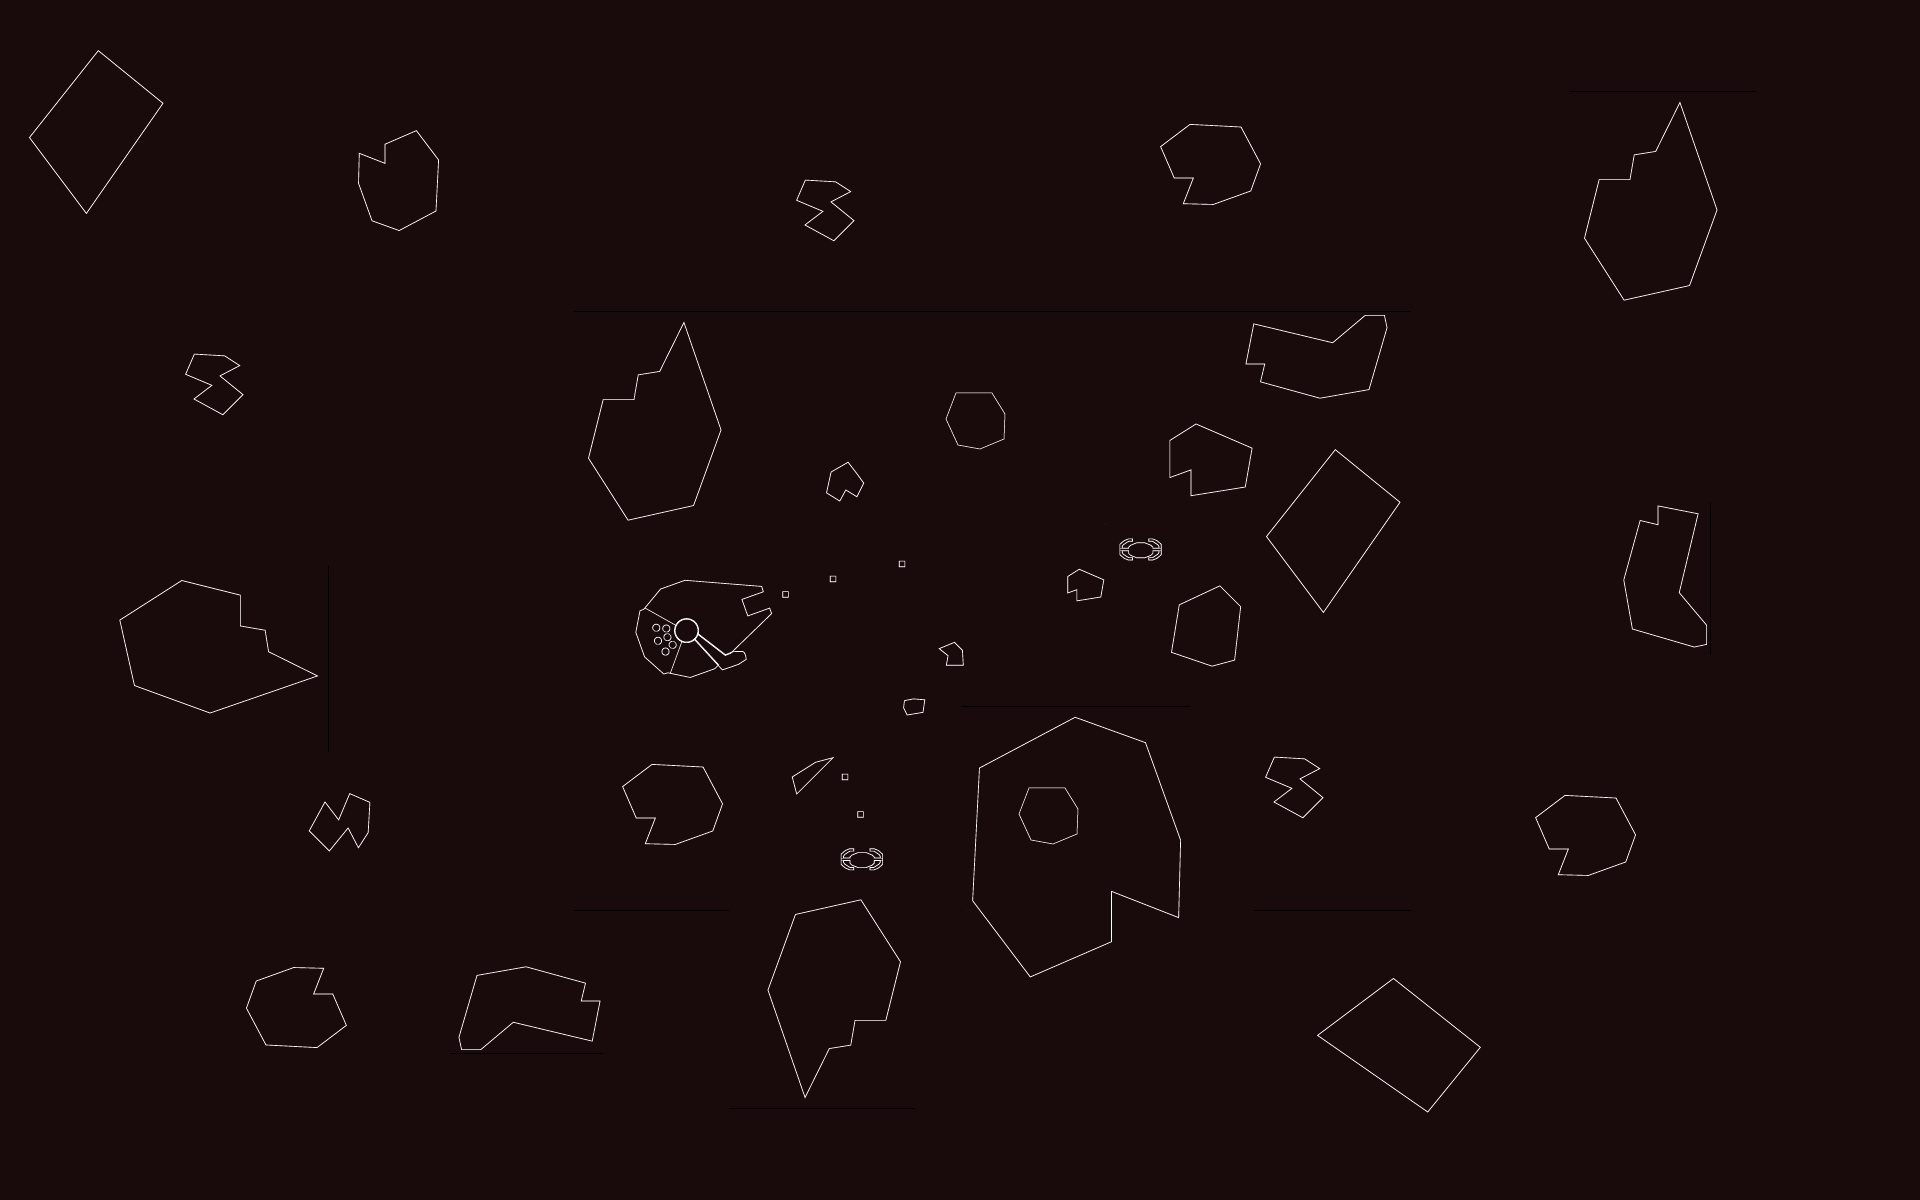 retro games asteroids falcon millenium wallpaper wallpapers imagesjpg 1920x1200